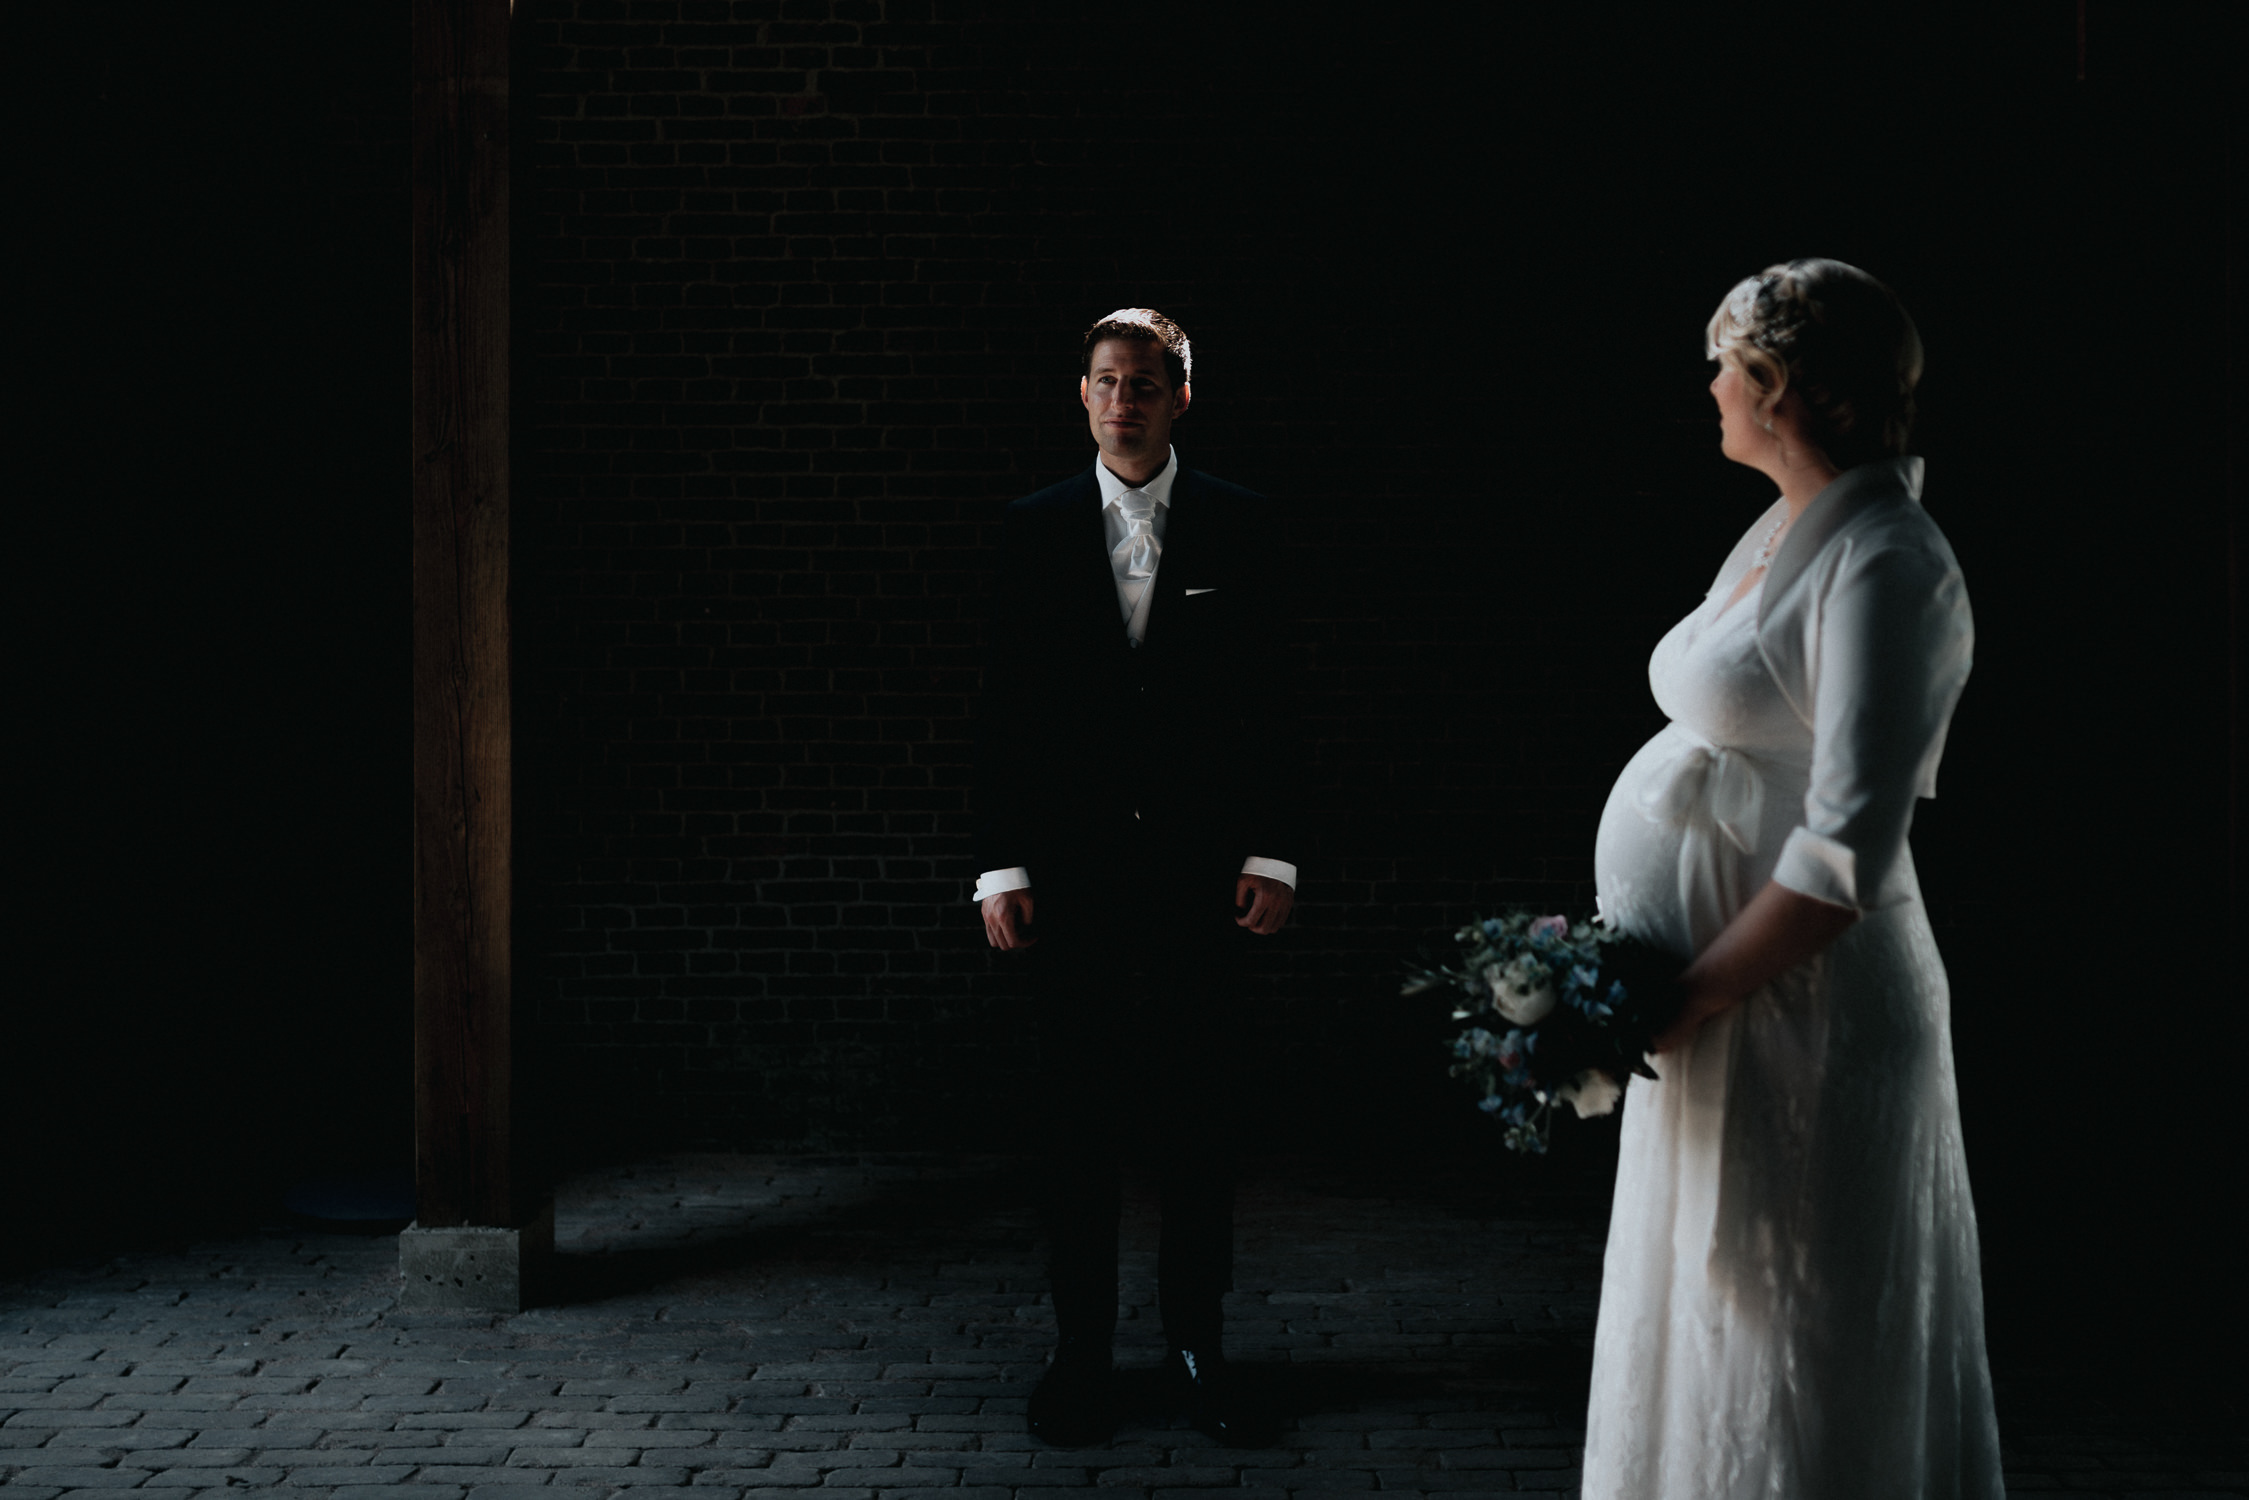 bruidsfotografie-amsterdam-utrecht-mark-hadden-wedding-photography-rowan-gideon-125-2.jpg